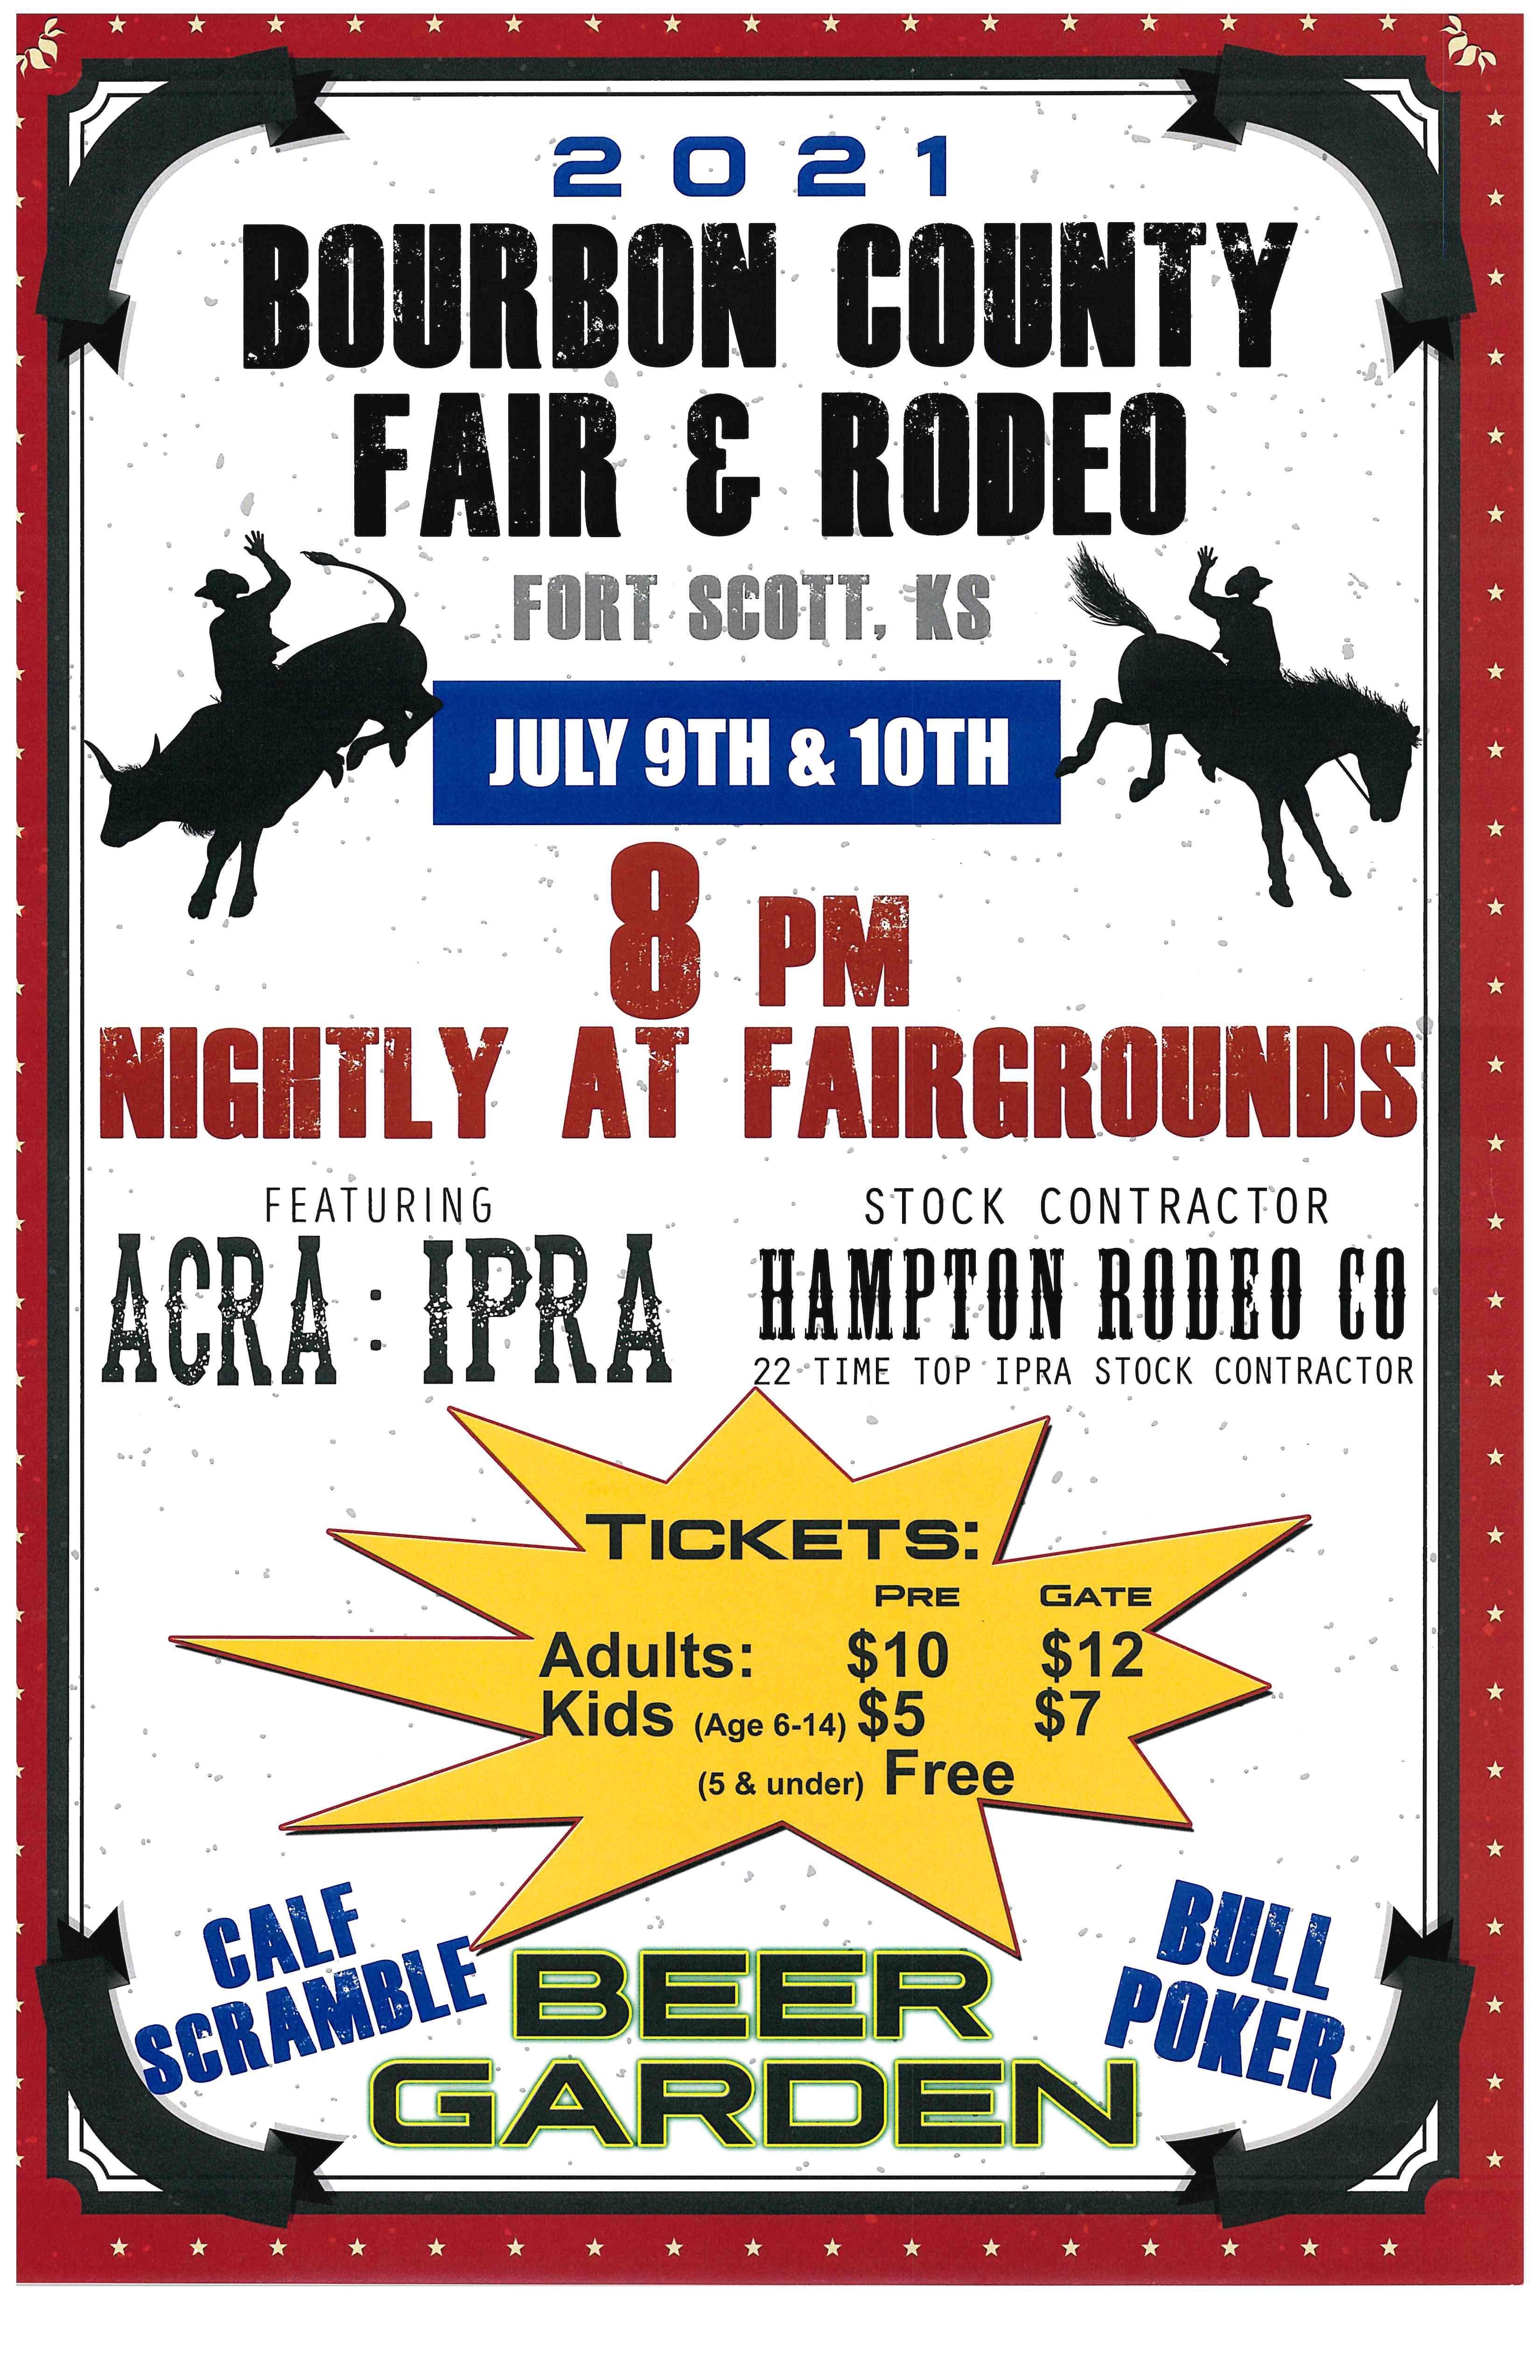 Rodeo-Poster---Bourbon-County-Fair-2021.jpg